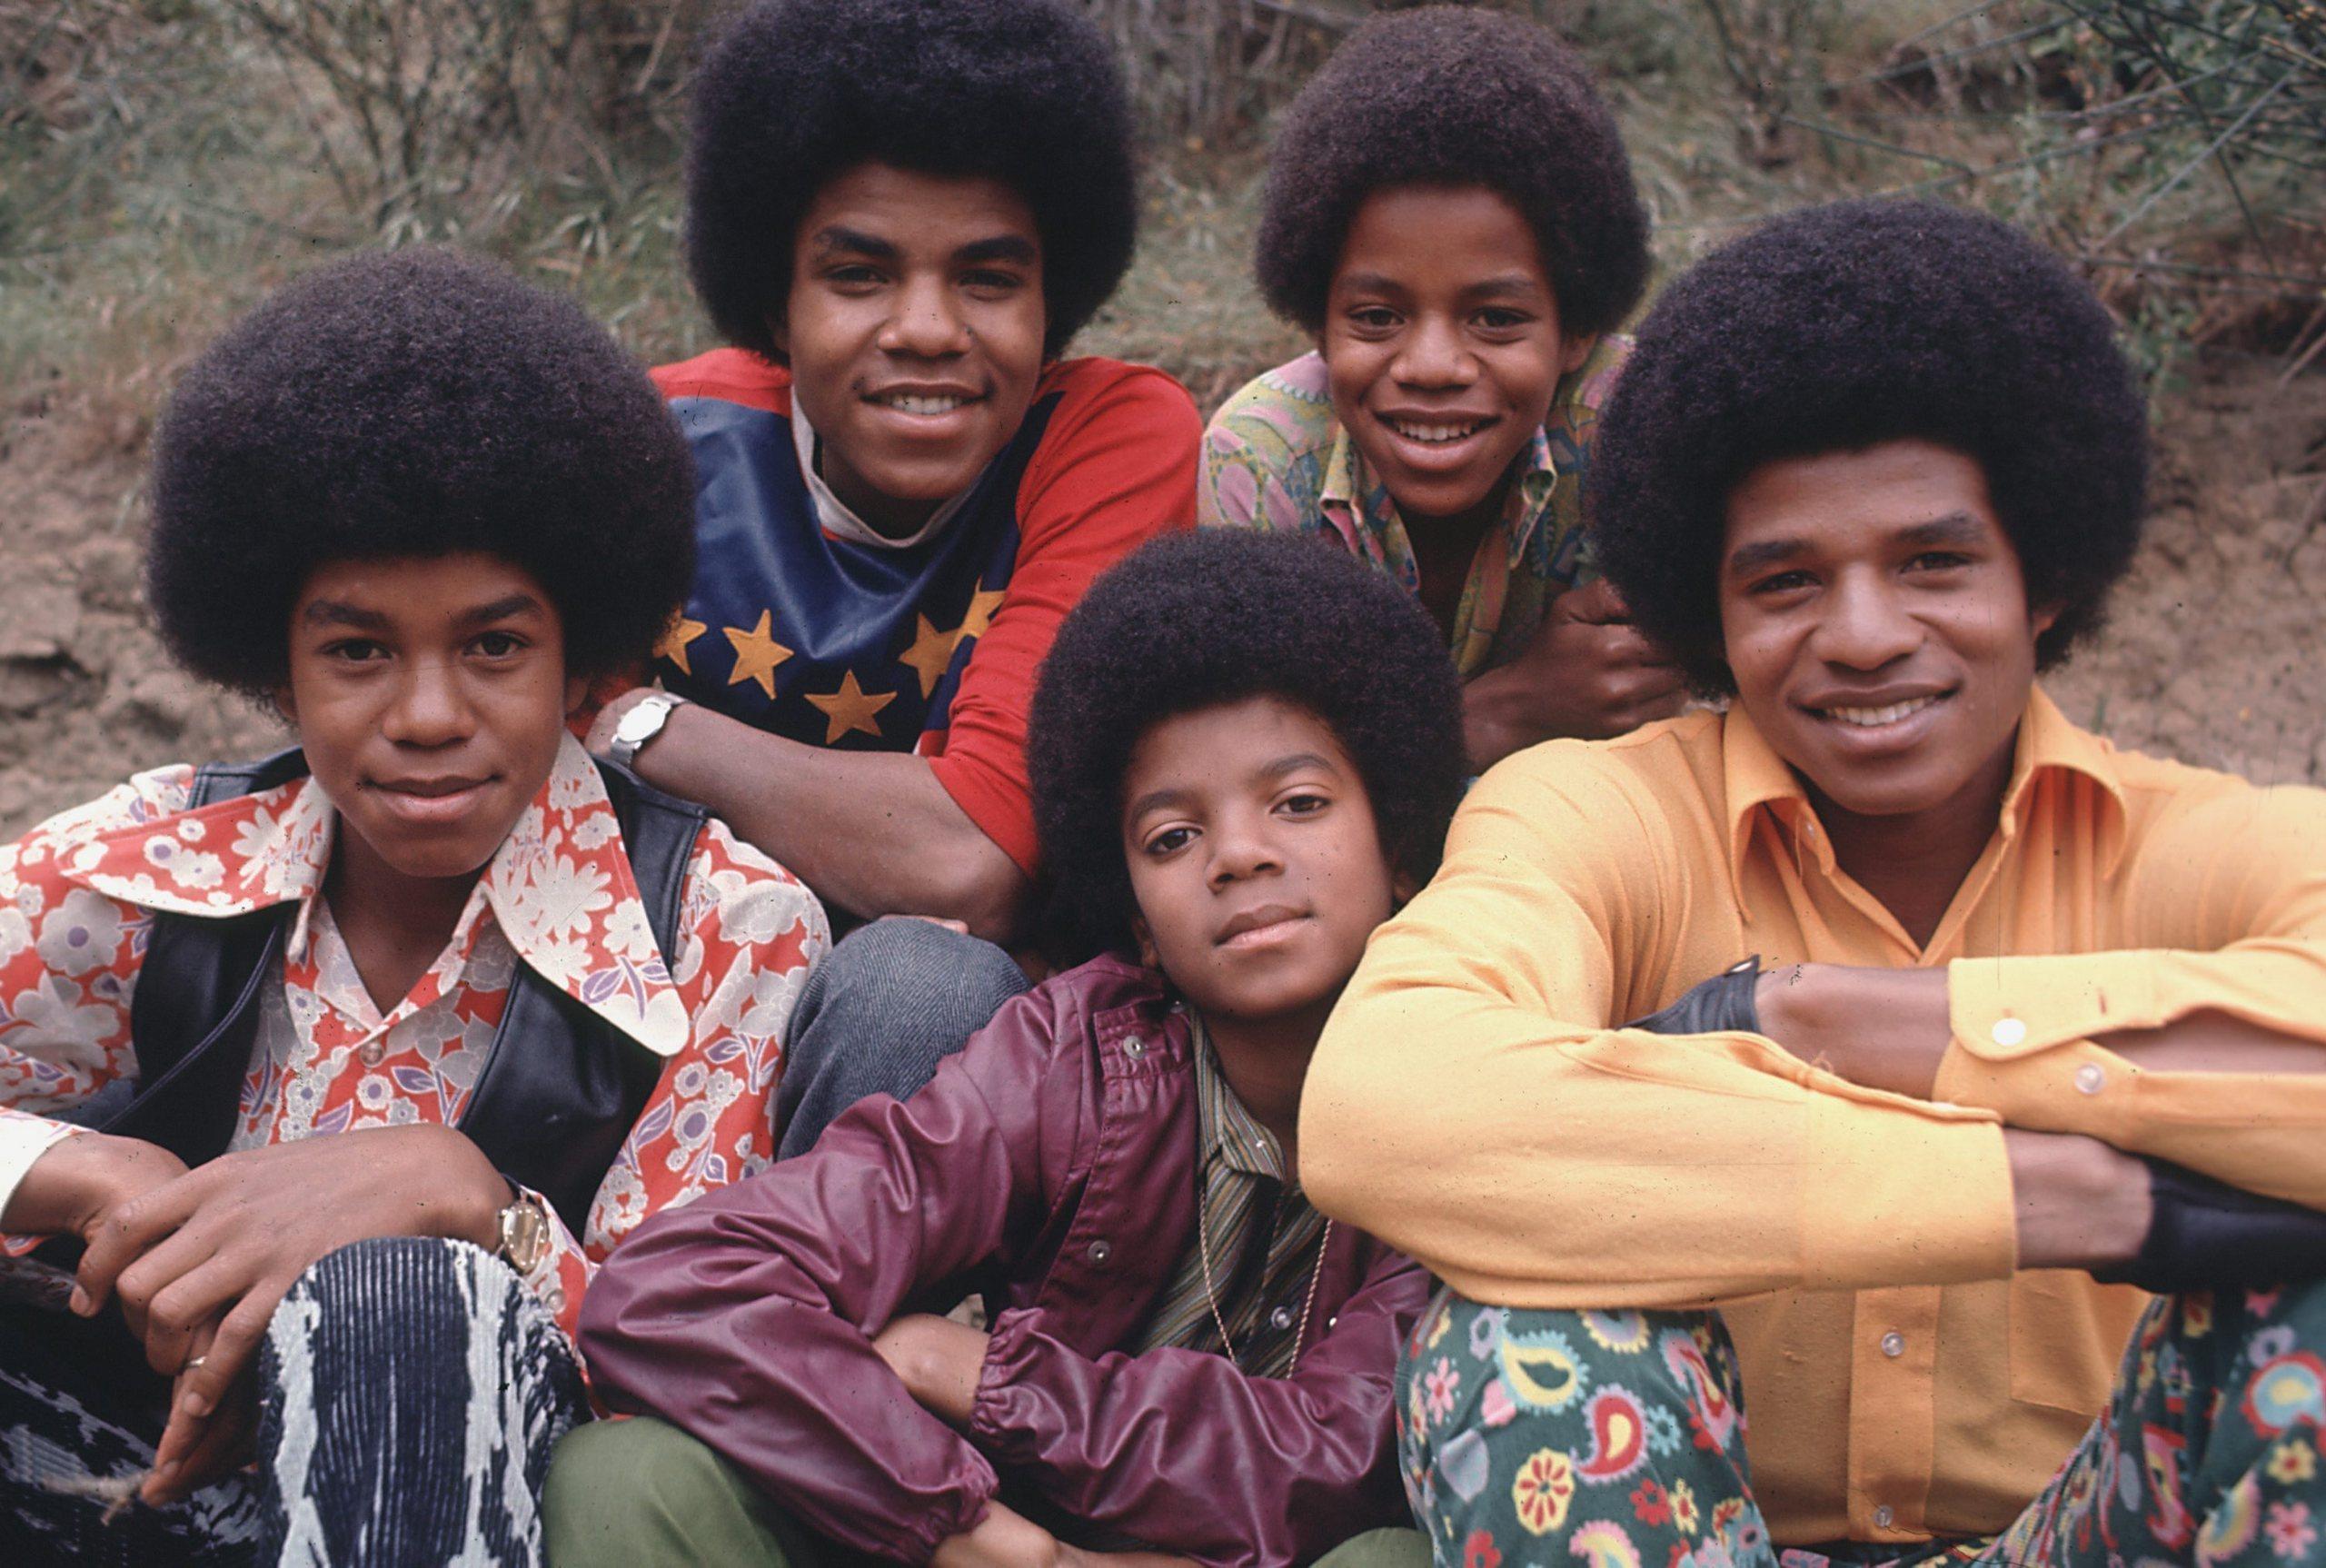 The Jackson 5 michael jackson